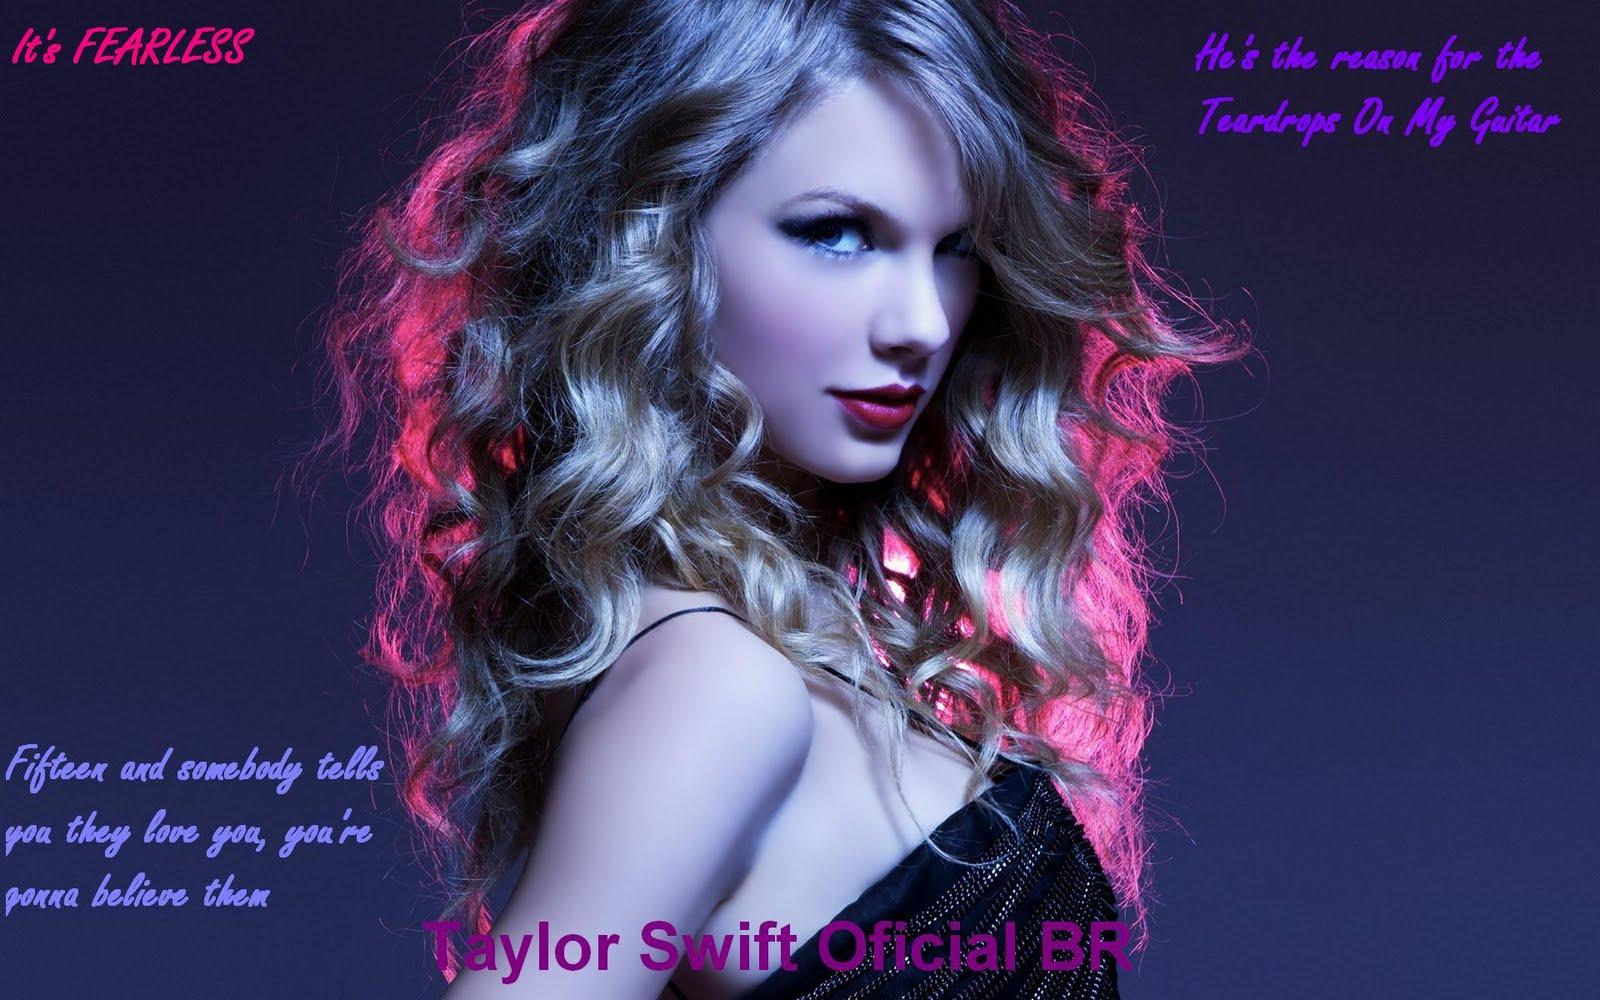 http://3.bp.blogspot.com/-xMMrOk2td3c/TgXy4pdRR4I/AAAAAAAAAAU/nFNMtkGMsIY/s1600/stagelightstaylorswift-238923.jpeg